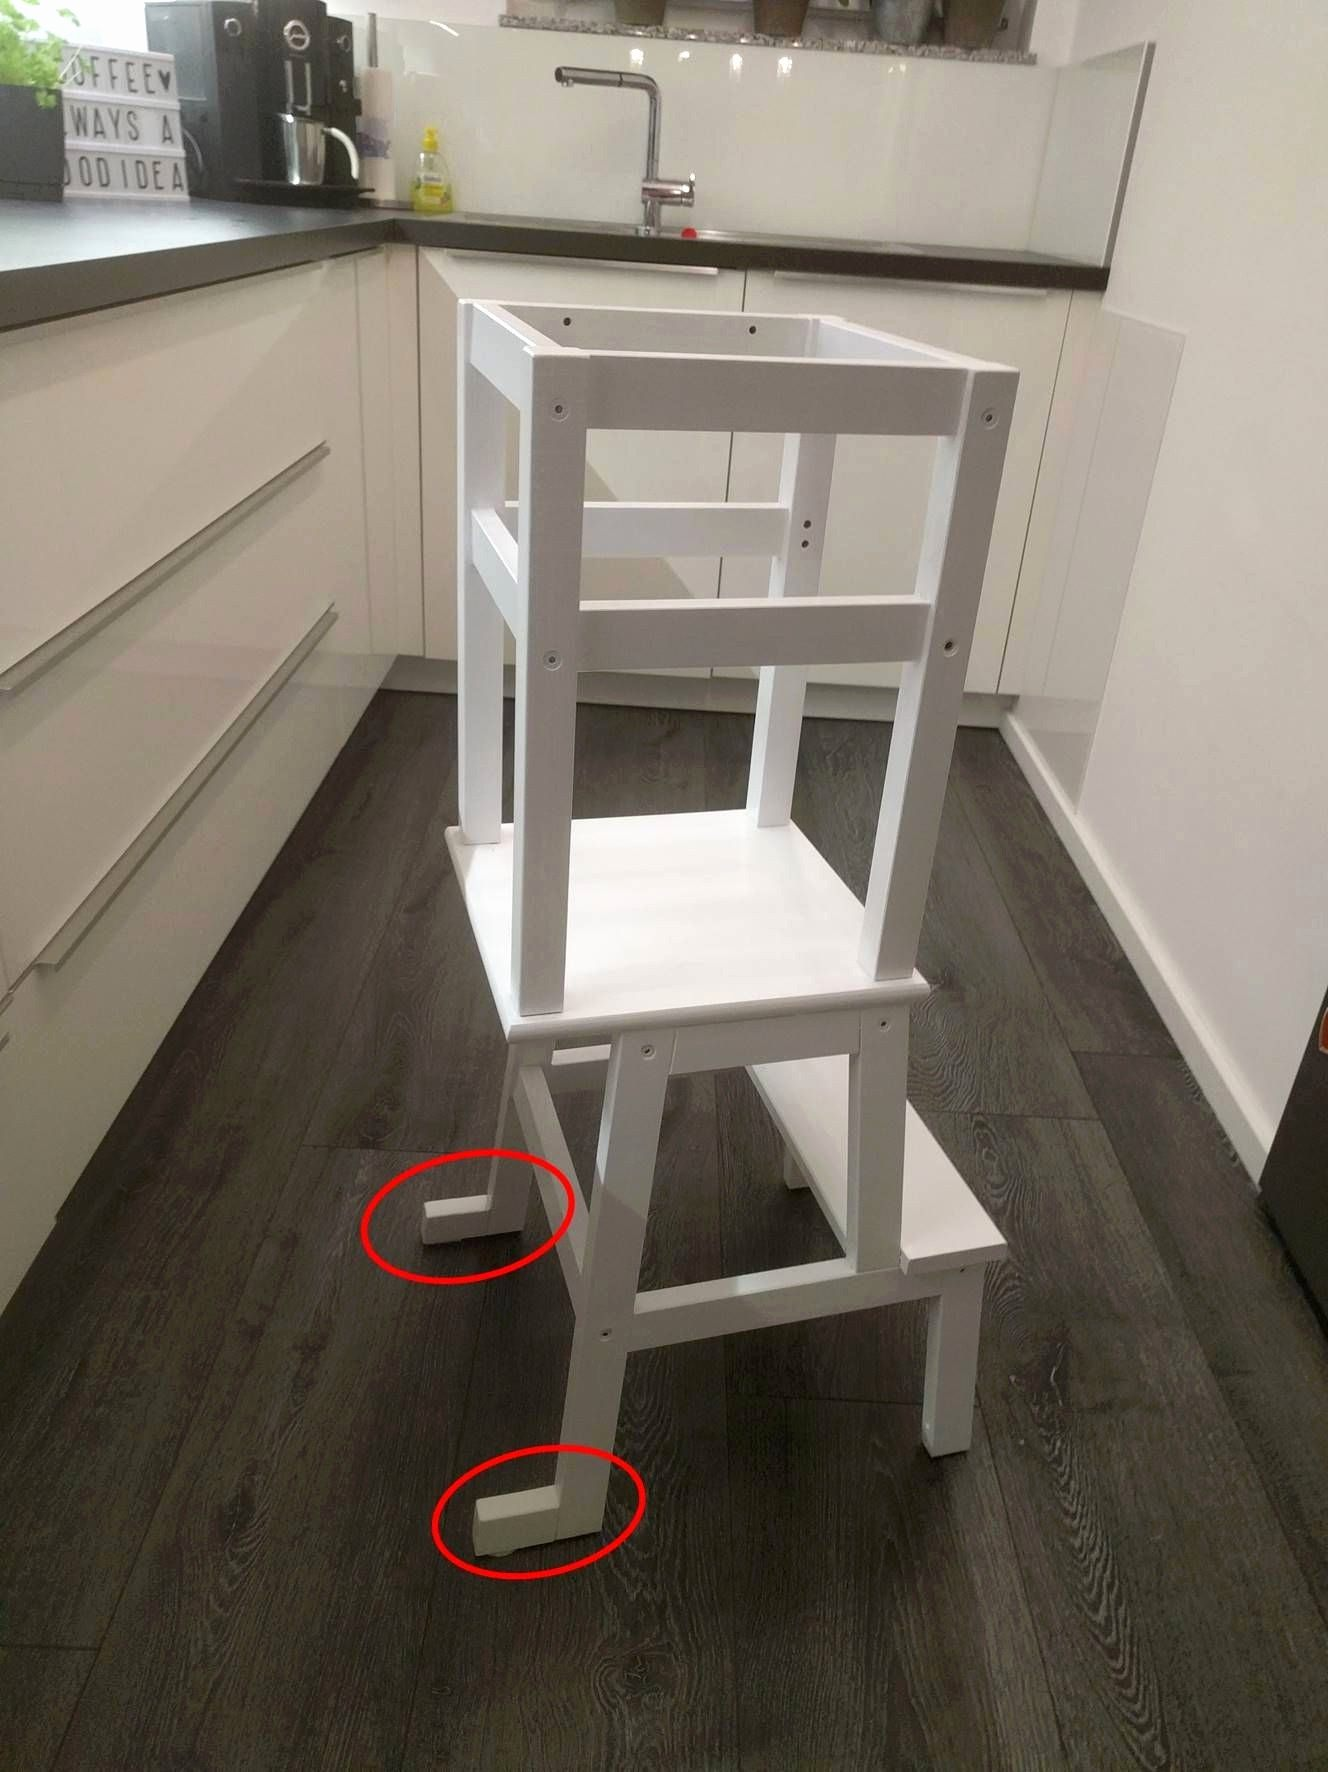 Lit Mezzanine Bureau Armoire Charmant Lit Superposé Adulte Ikea Le Meilleur De Lit Mezzanine Bureau